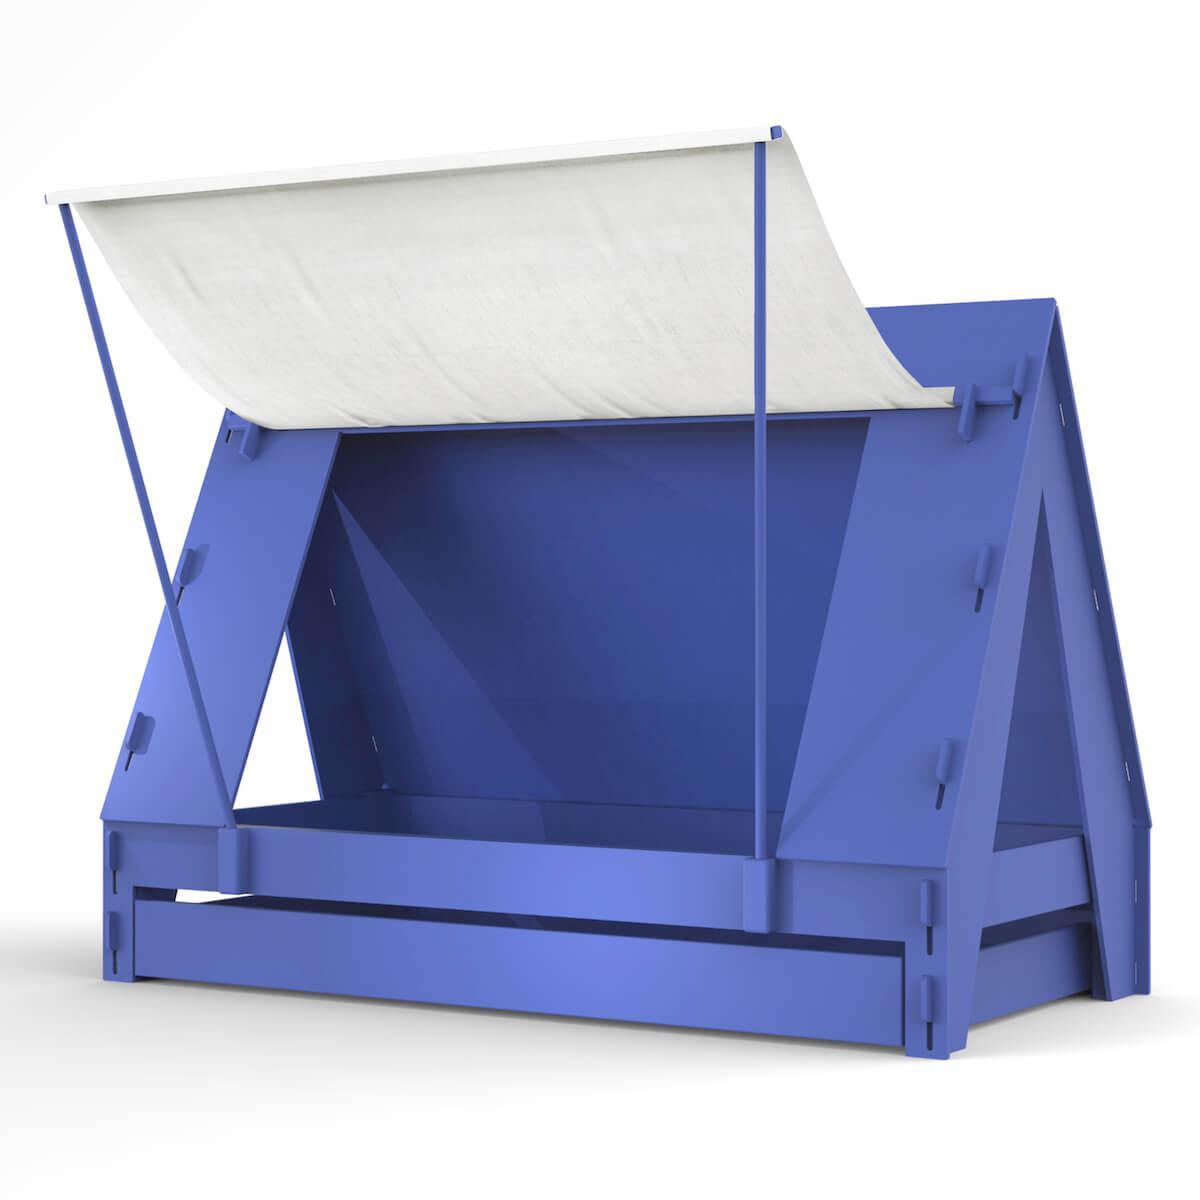 Lit bas-tiroir 90x200cm TENTE Mathy by Bols bleu marseille